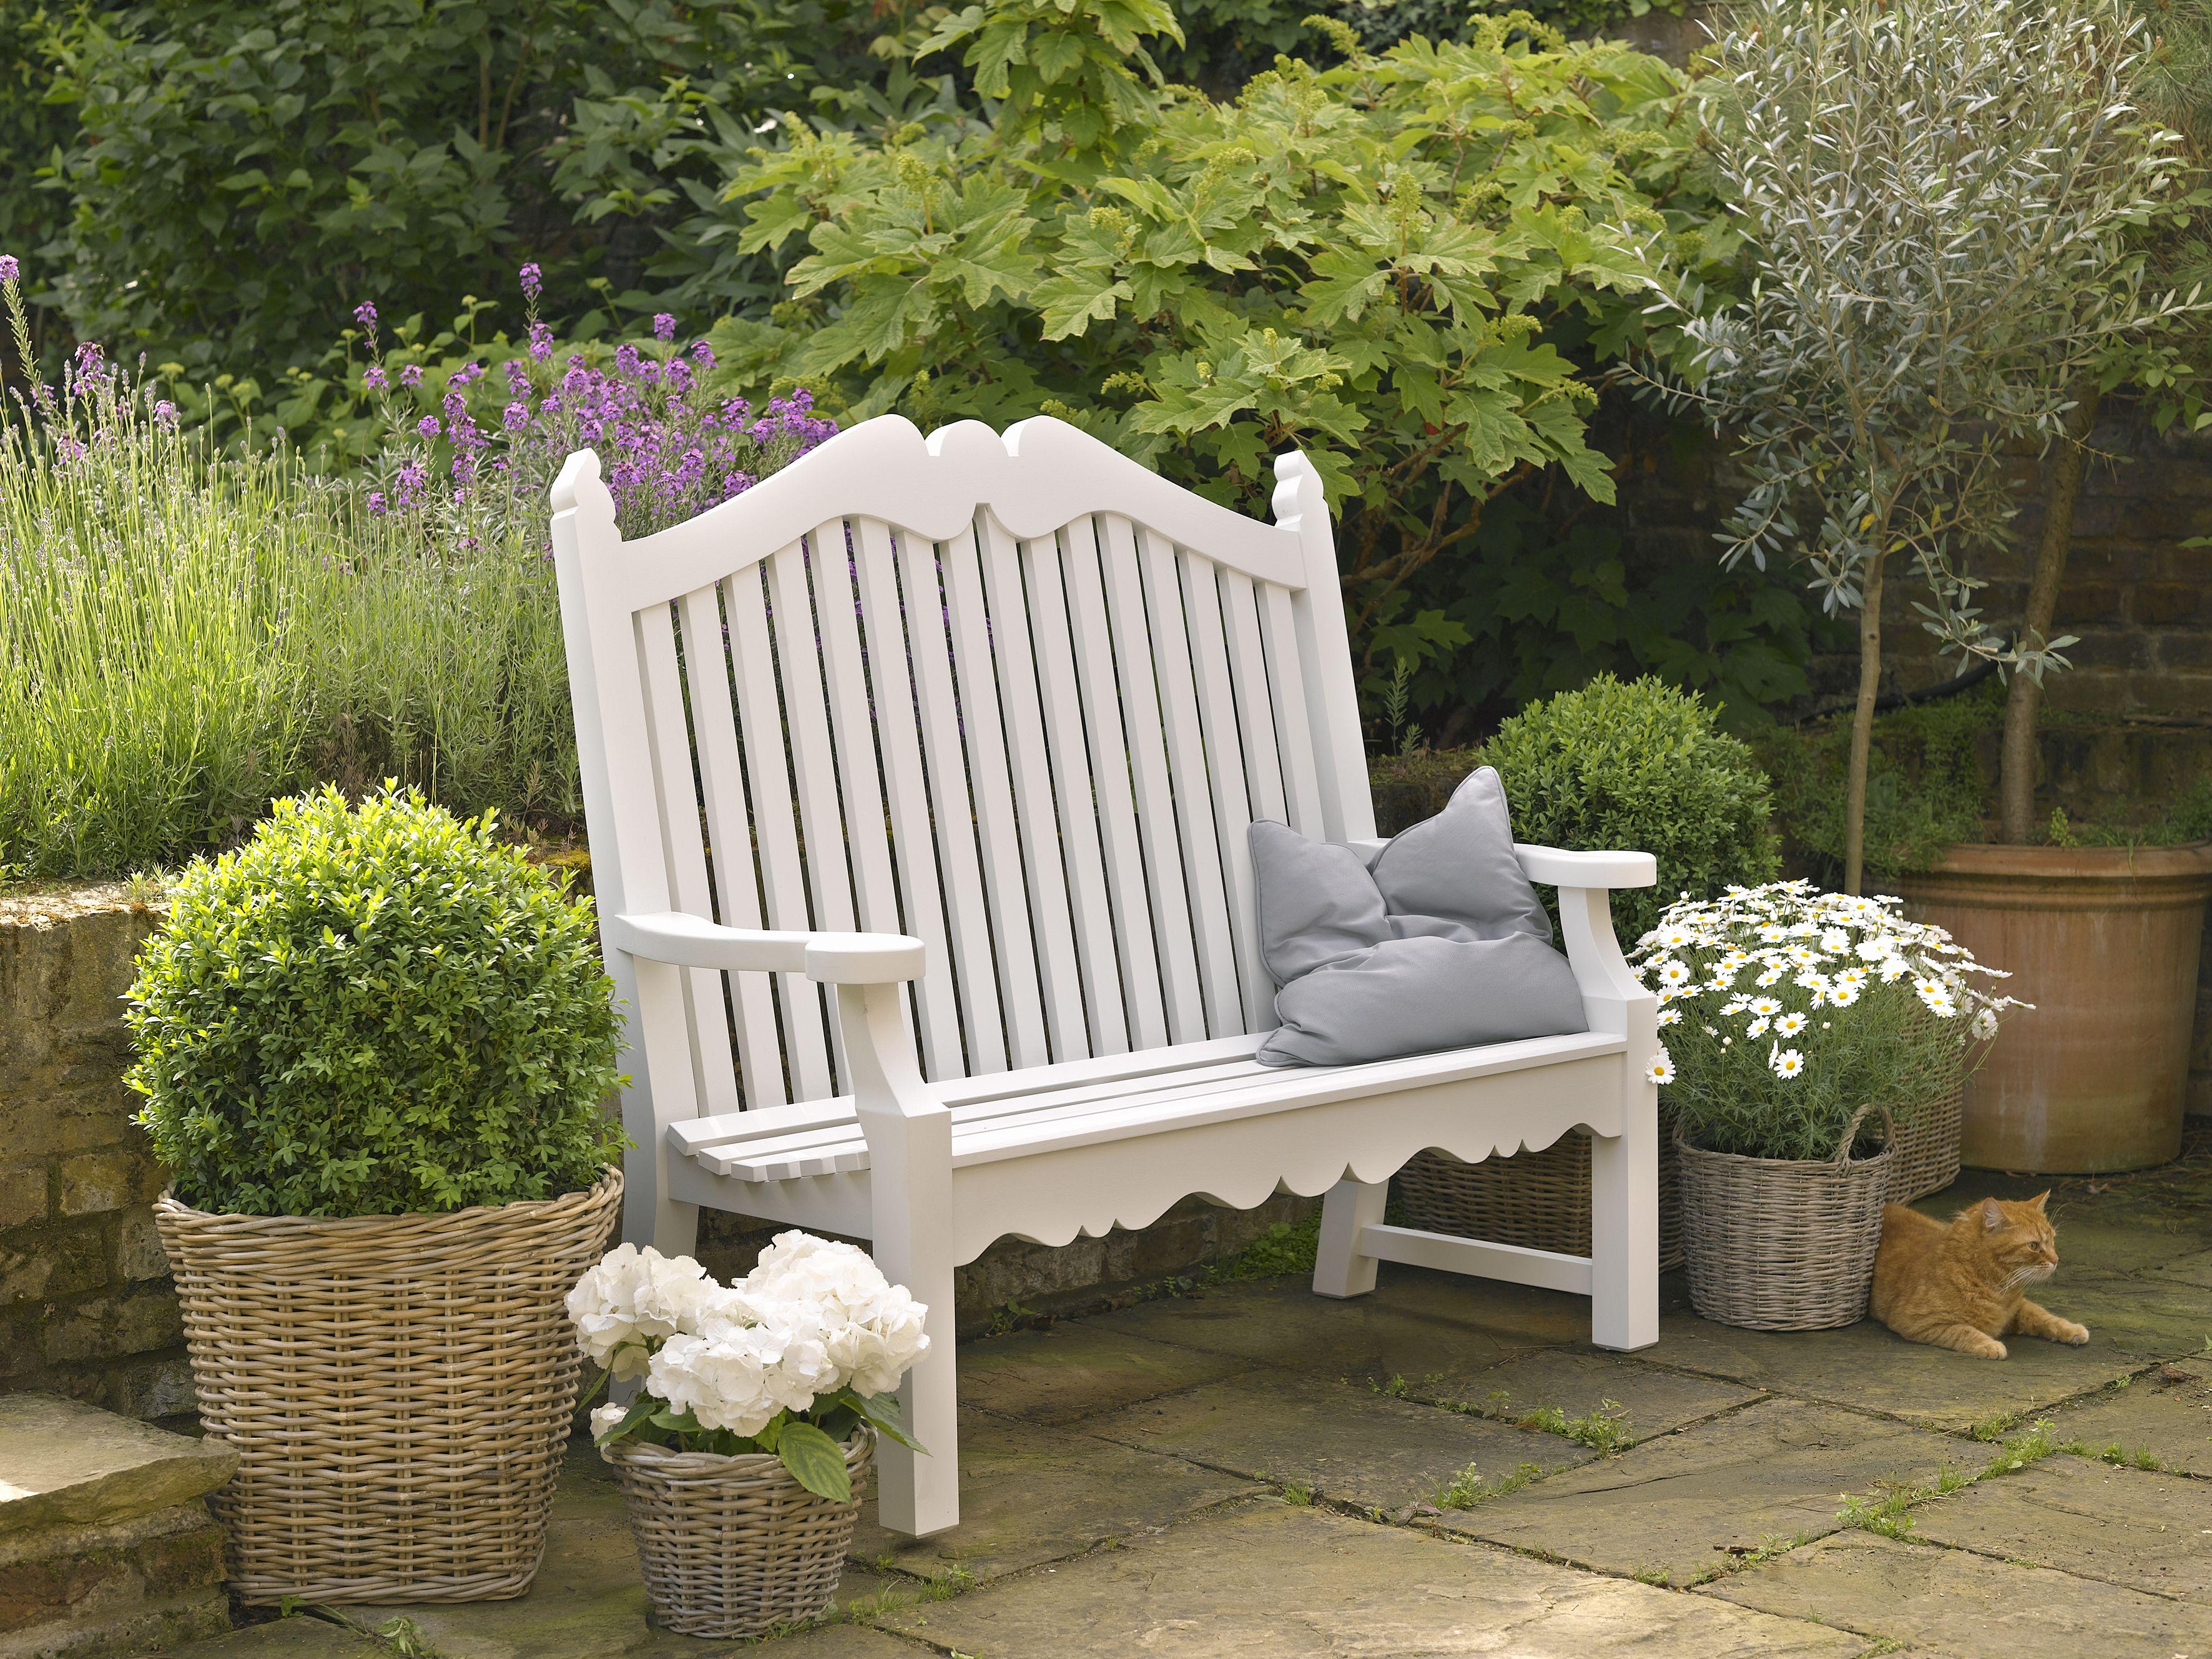 Hand Painted Garden Bench